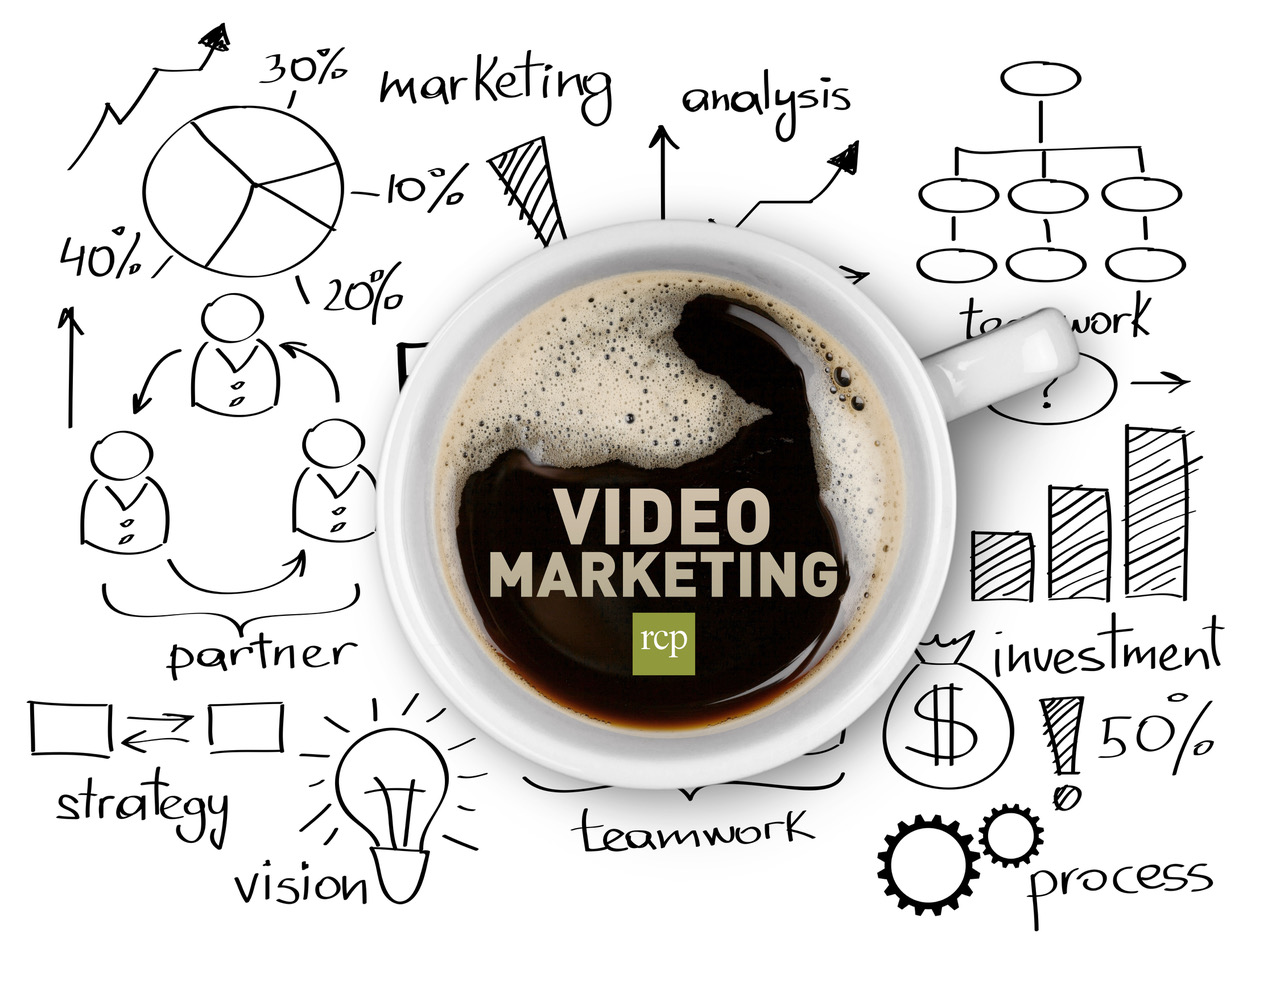 Video Marketing Trends in 2017